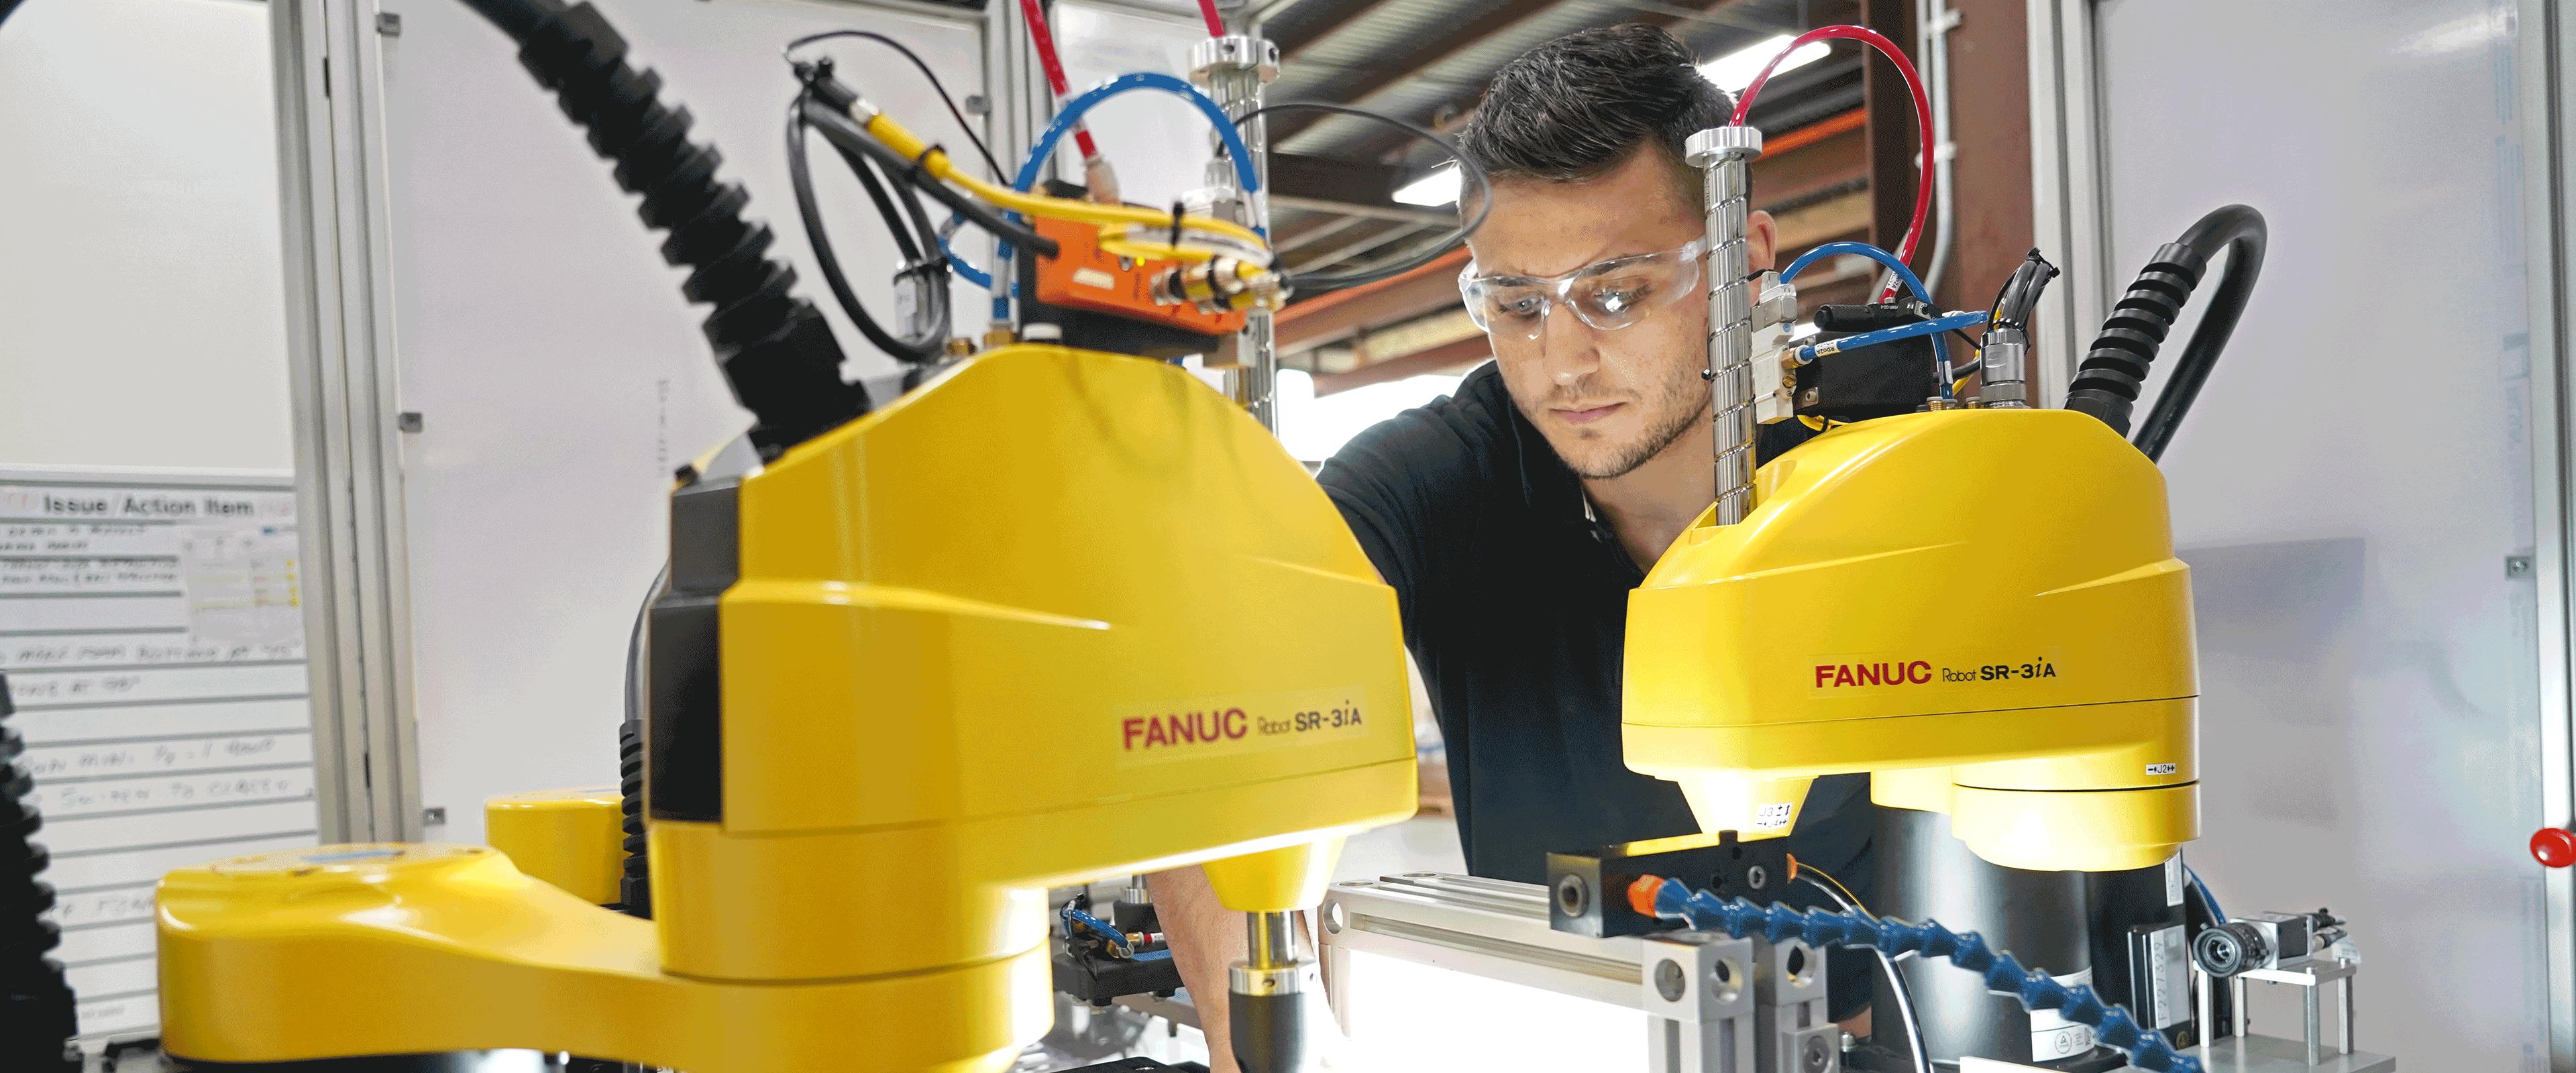 Joseph Backe works with large technology machines